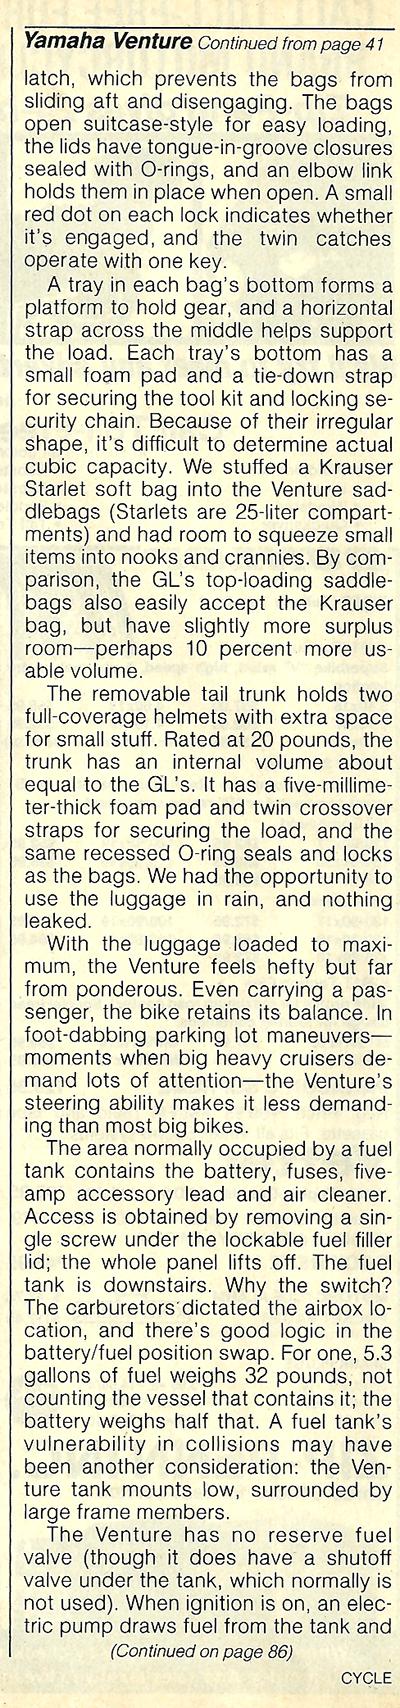 1983 Yamaha XVZ12TK Venture road test 11.jpg